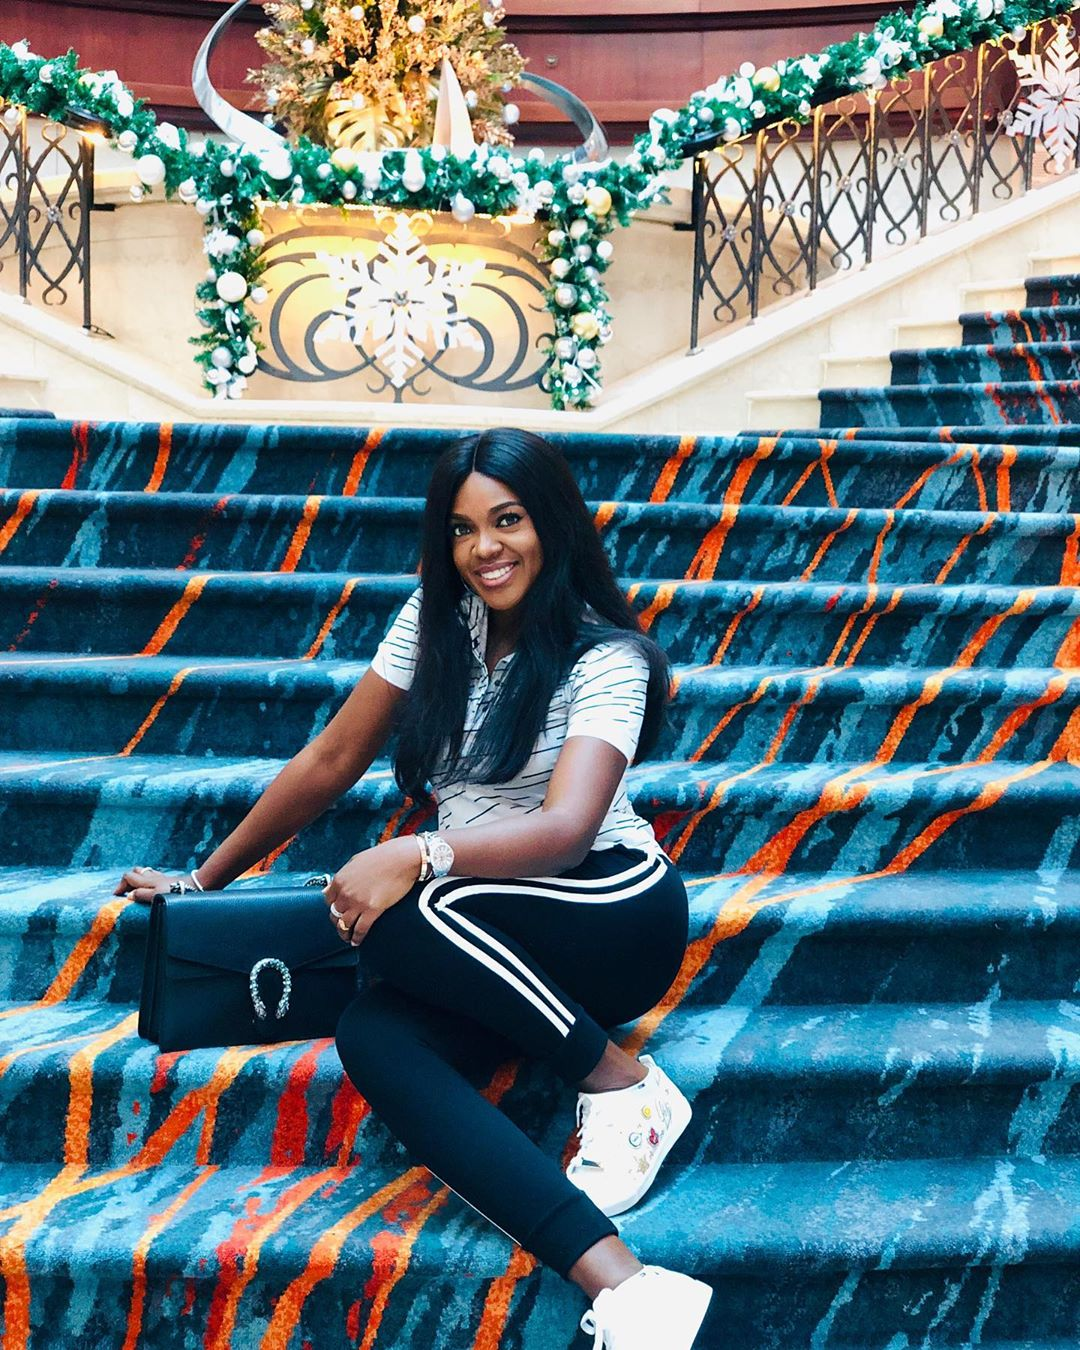 'Bringing down someone to climb the ladder is witchcraft' – Omoni Oboli